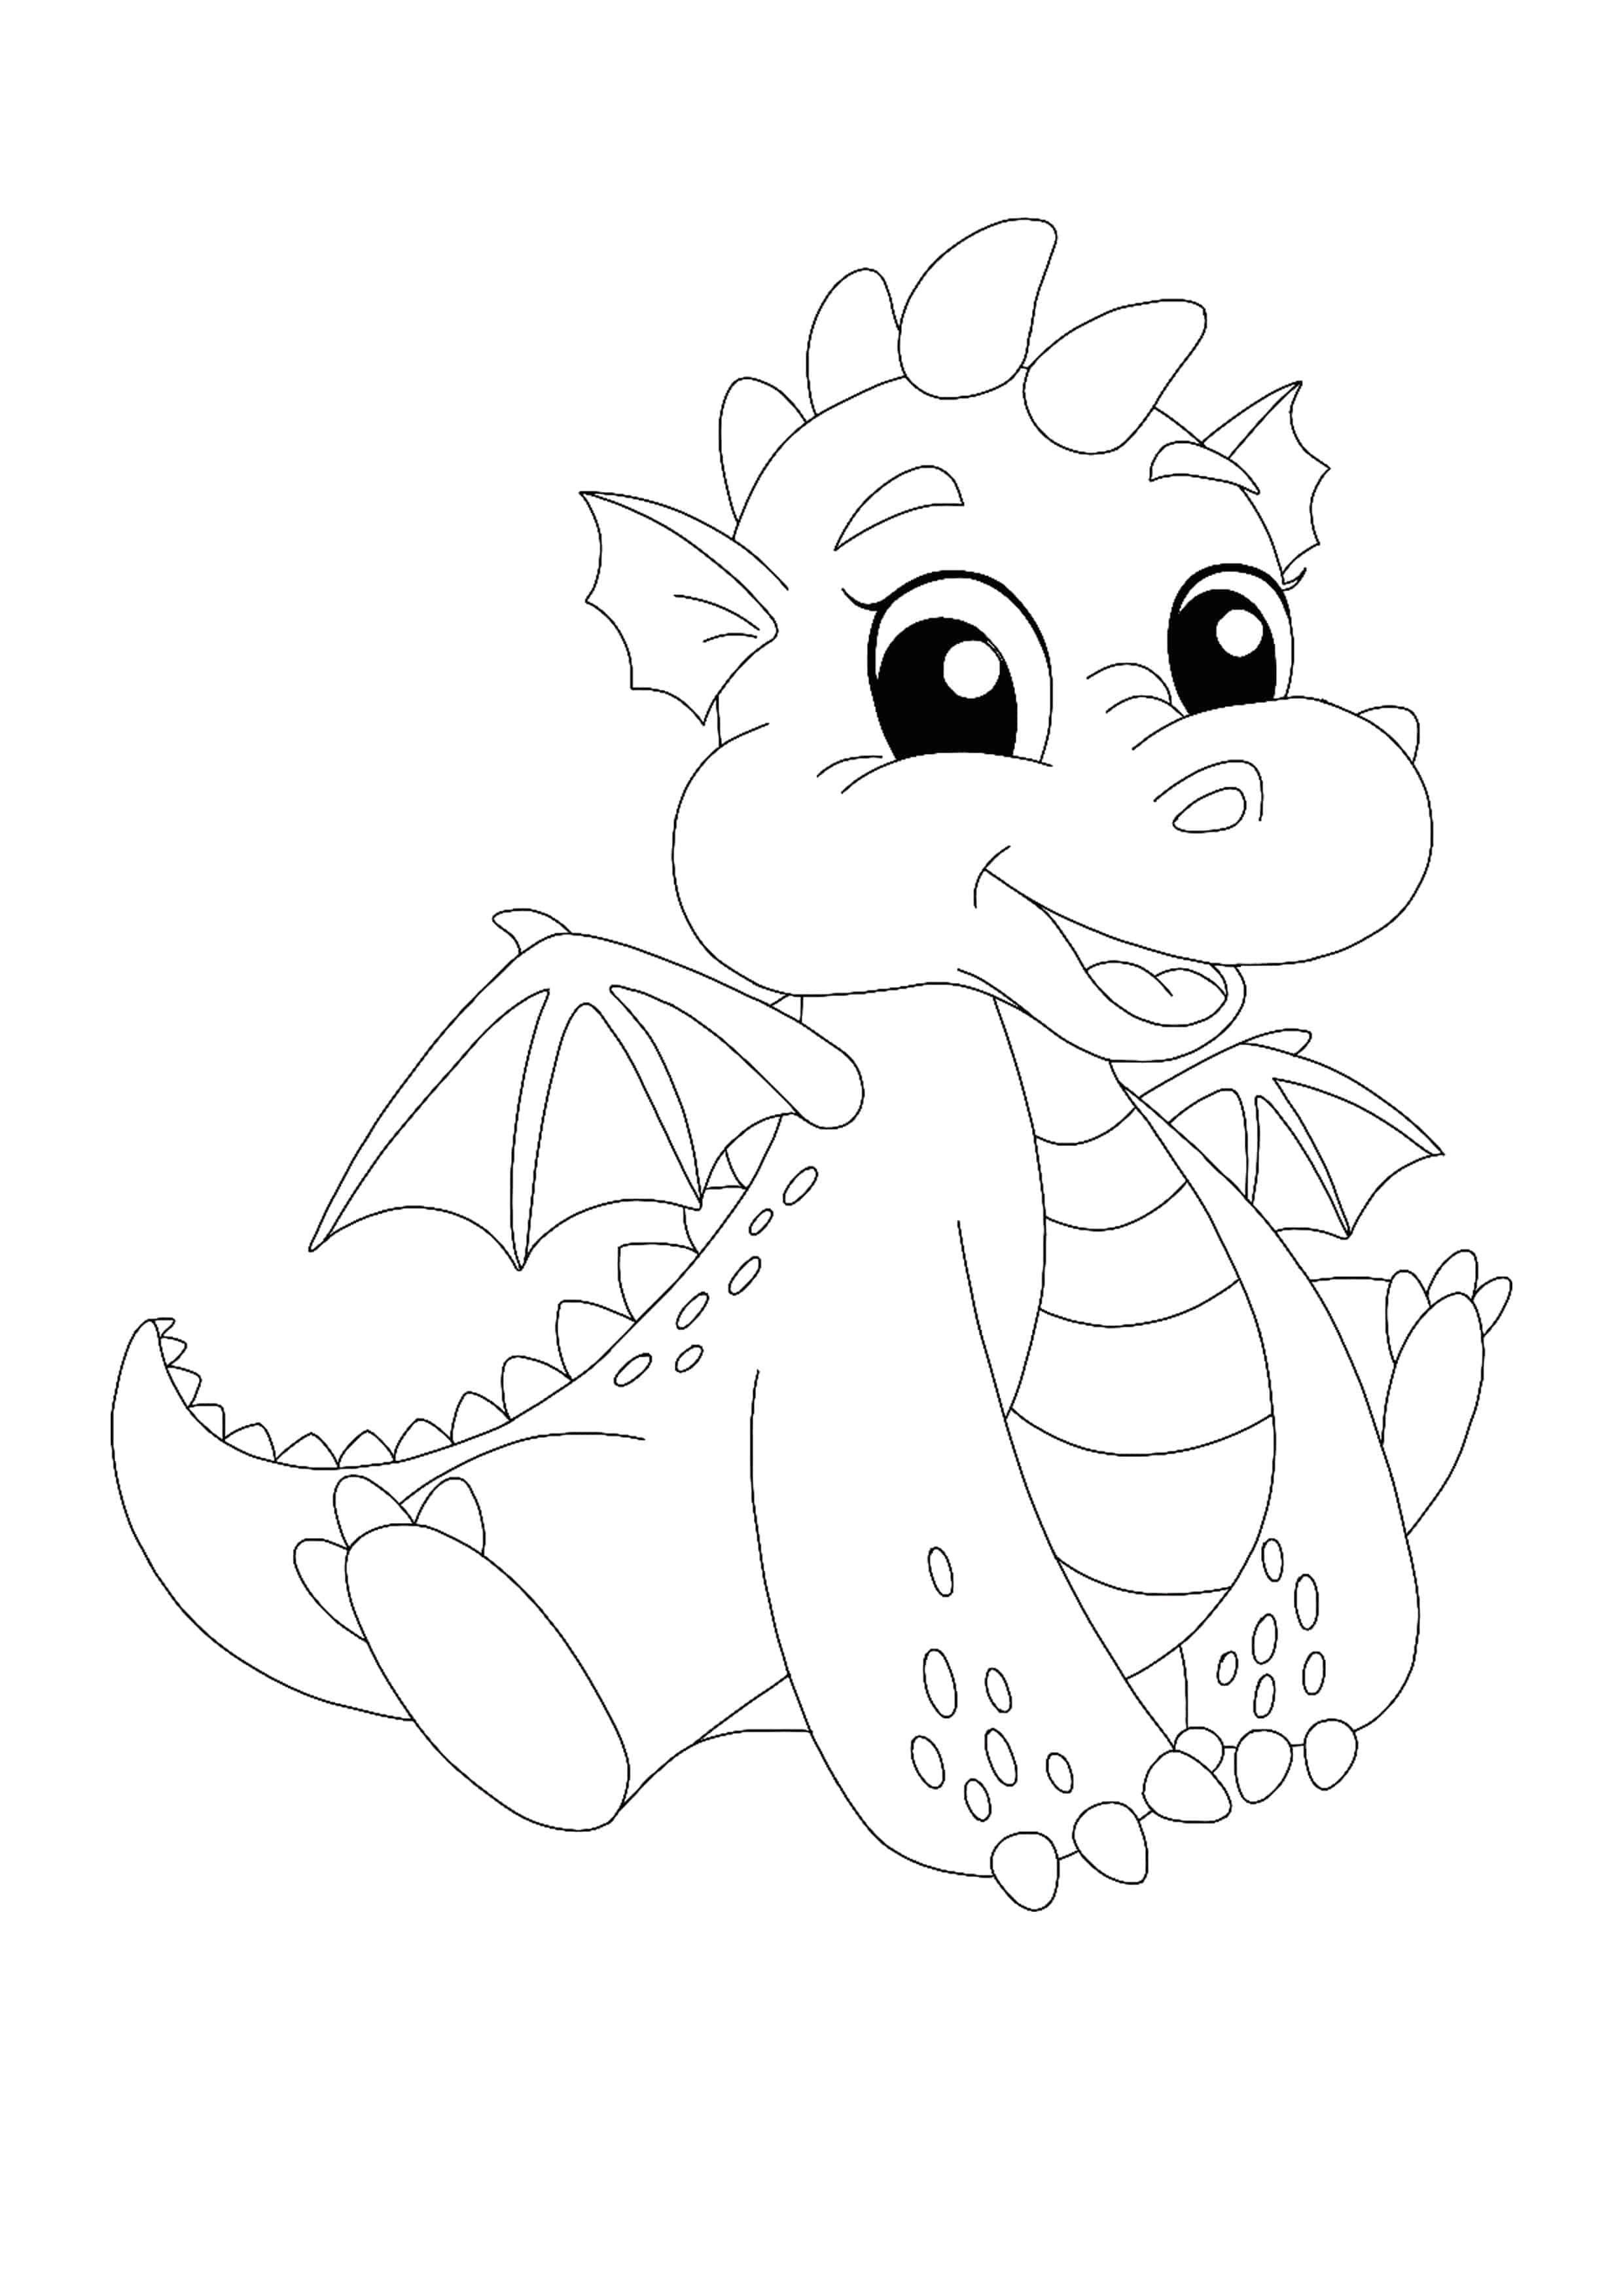 Cute Kawaii Dragon Coloring Page Dragon Coloring Pages Dragon Coloring Page Toy Story Coloring Pages